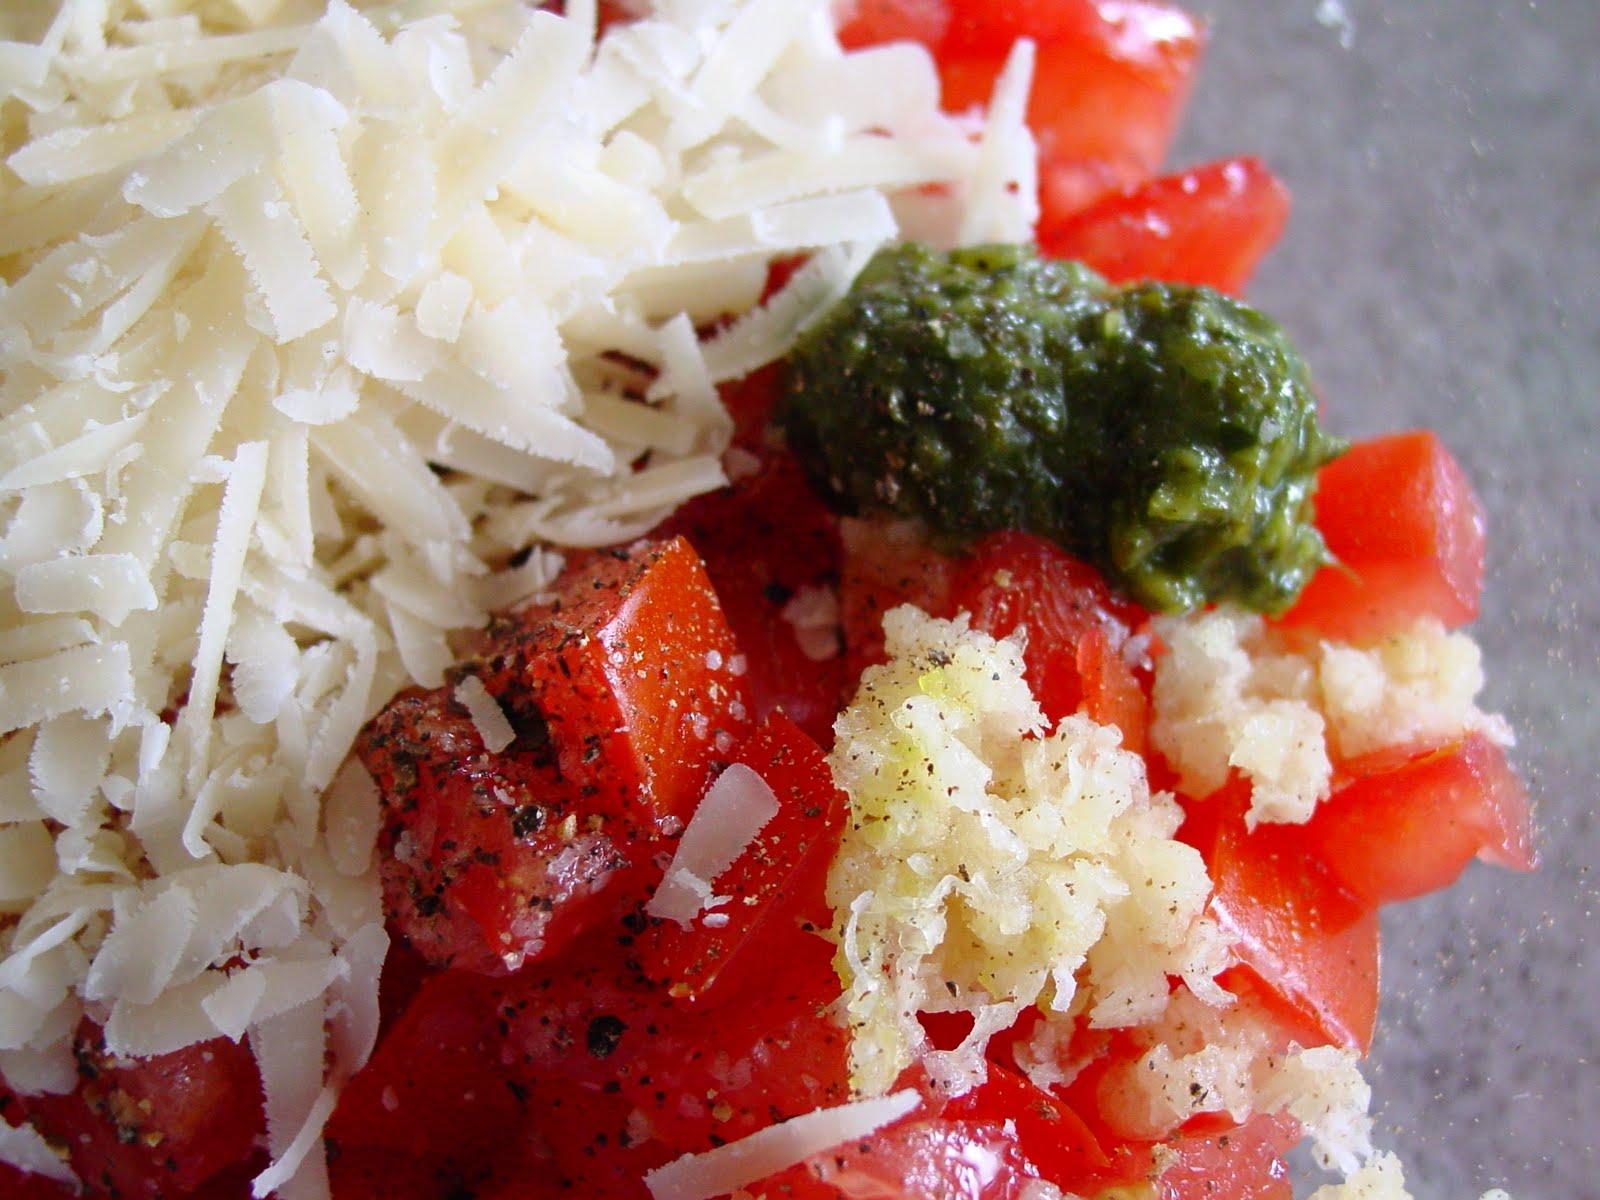 http://2.bp.blogspot.com/_hxA4j4yxueY/TBWIEyOz45I/AAAAAAAALpk/4uUSPNmlThw/s1600/Bruschetta+Burgers+014.JPG